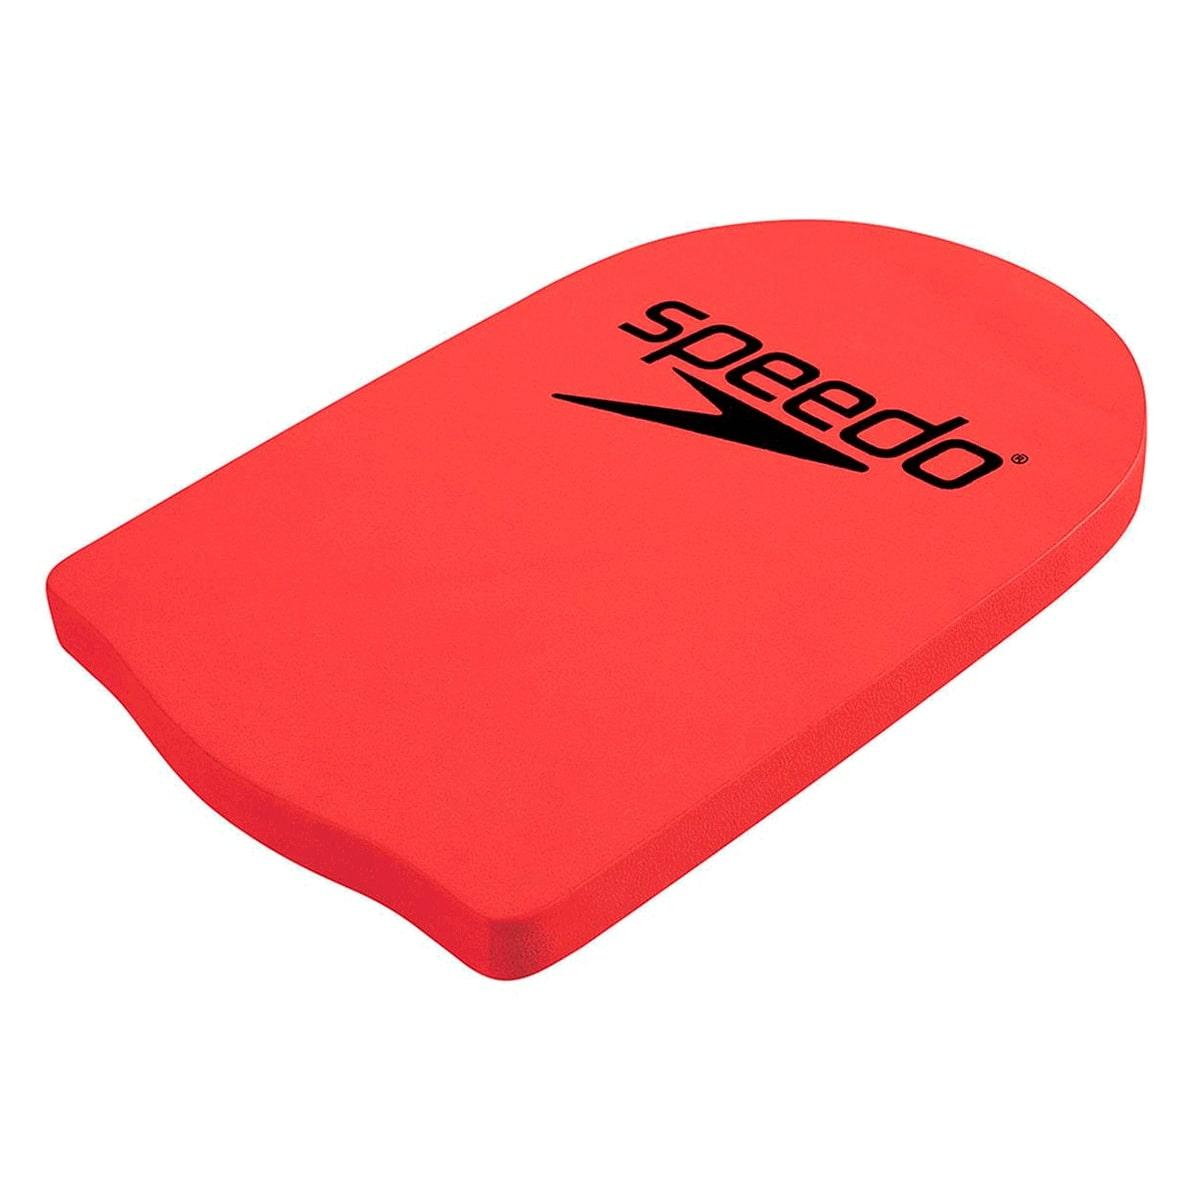 Prancha Natação Speedo Jet Board Vermelho